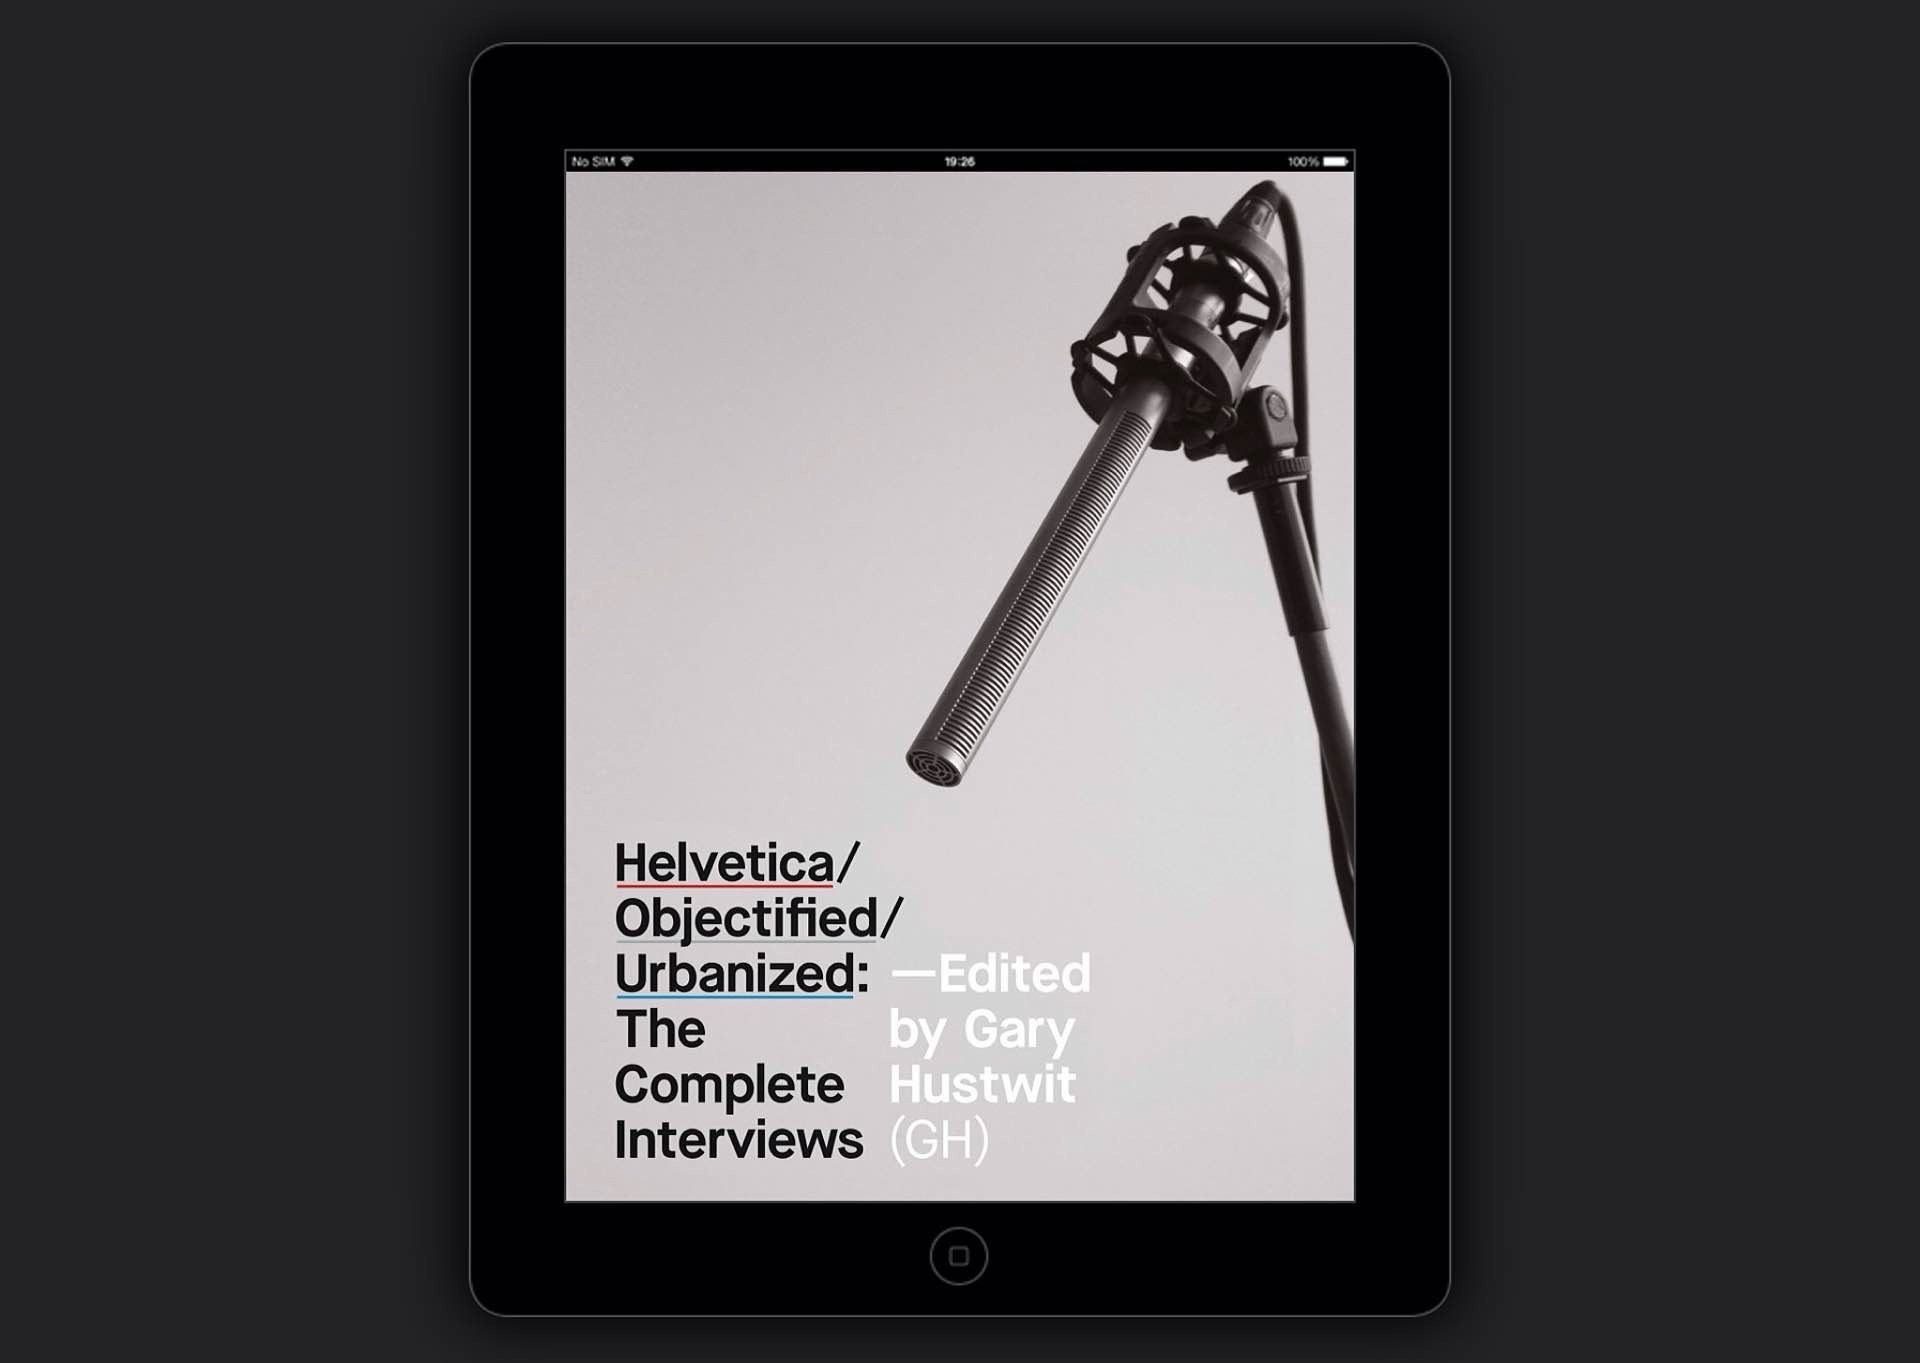 helvetica-objectified-urbanized-complete-interviews-gary-hustwit